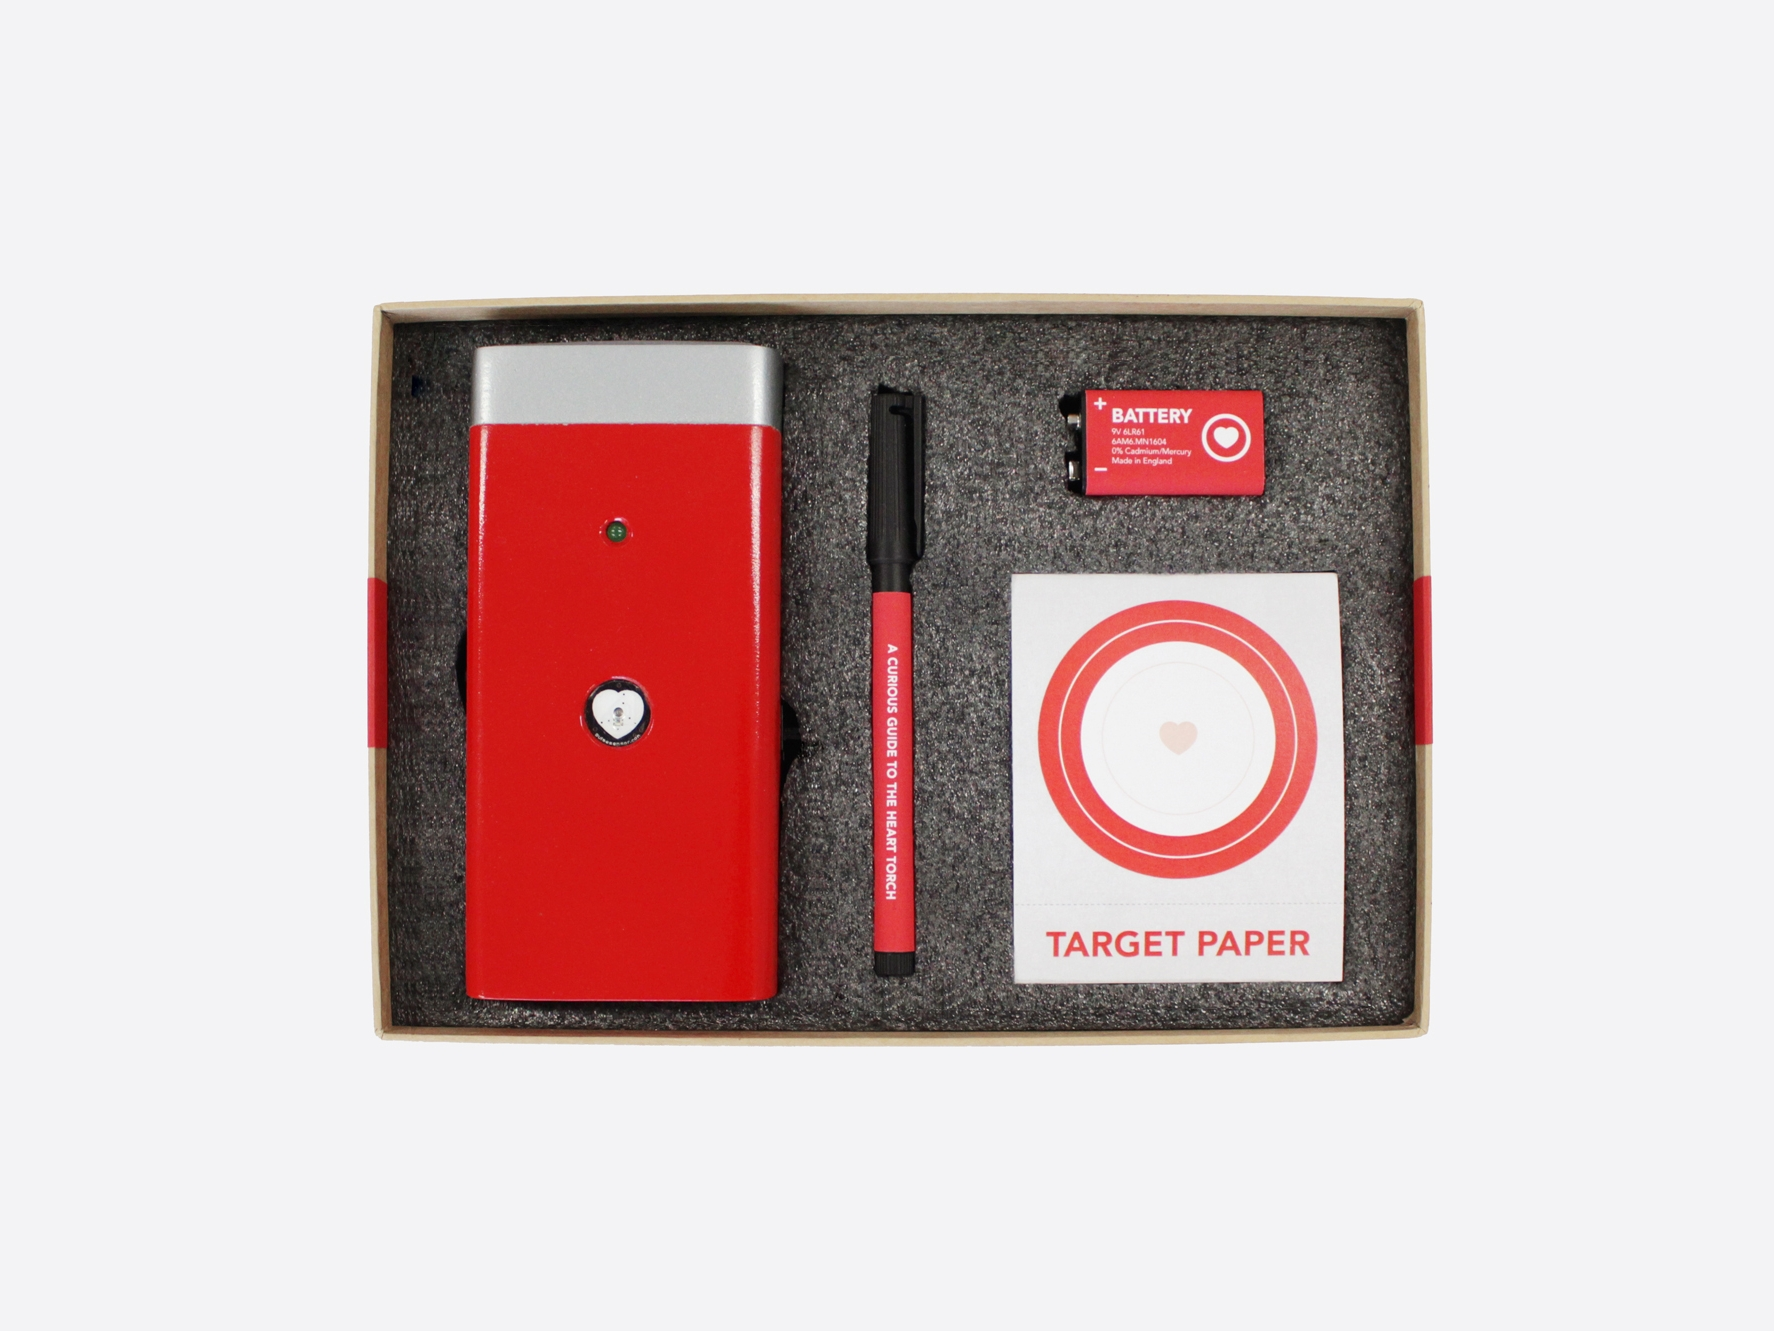 Heart Torch Tool-kit